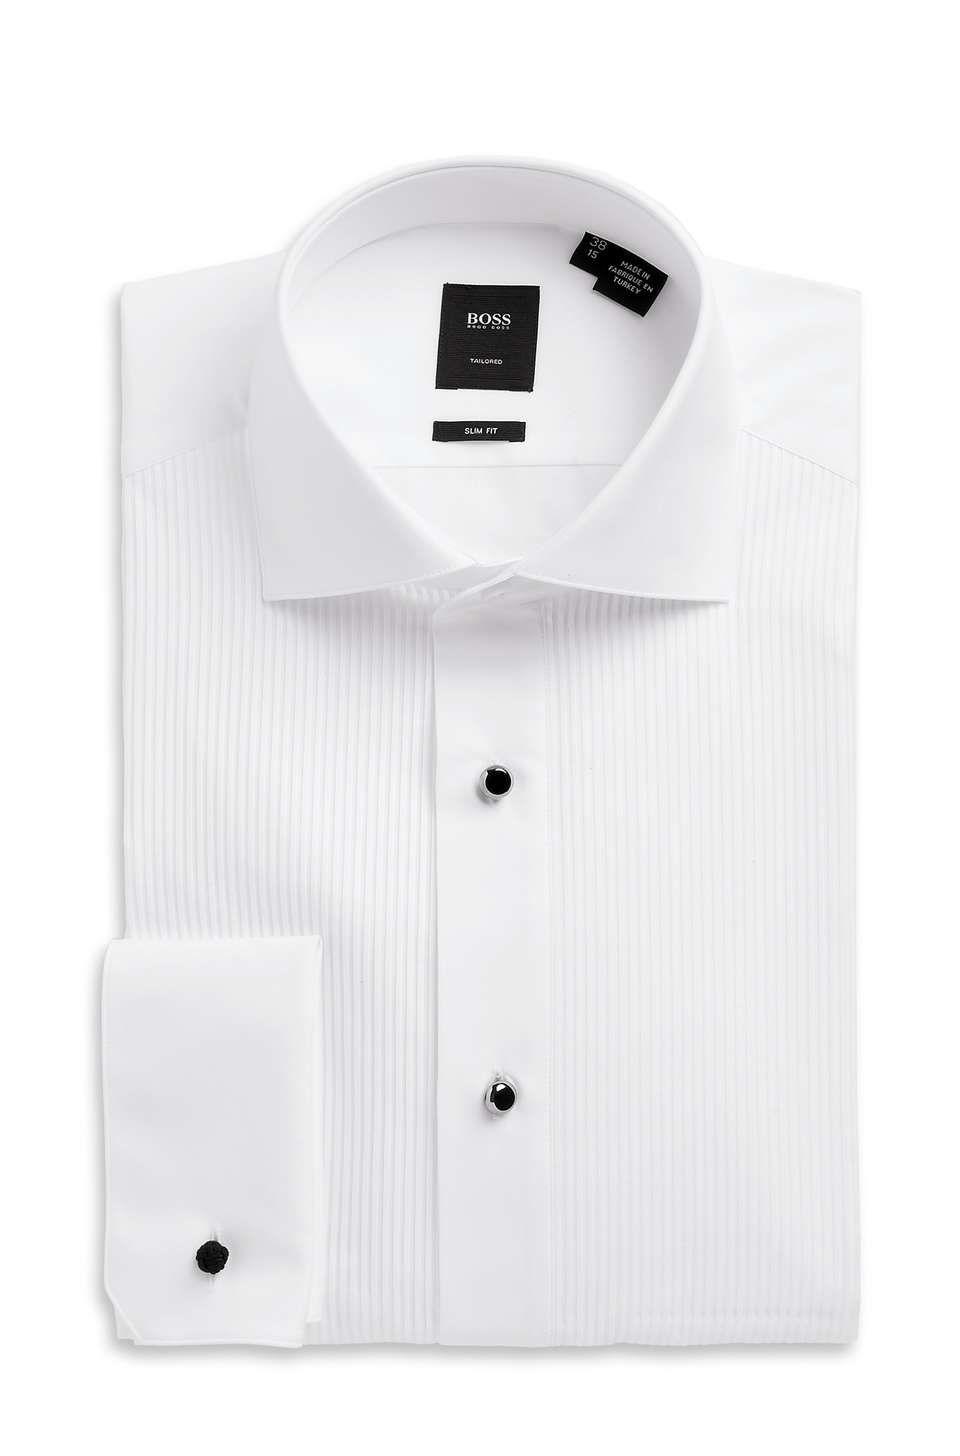 ec789274d27e Hugo Boss 'Valeriano' Tailored Slim Fit, Spread Collar Two-Ply Italian  Cotton Tuxedo Shirt